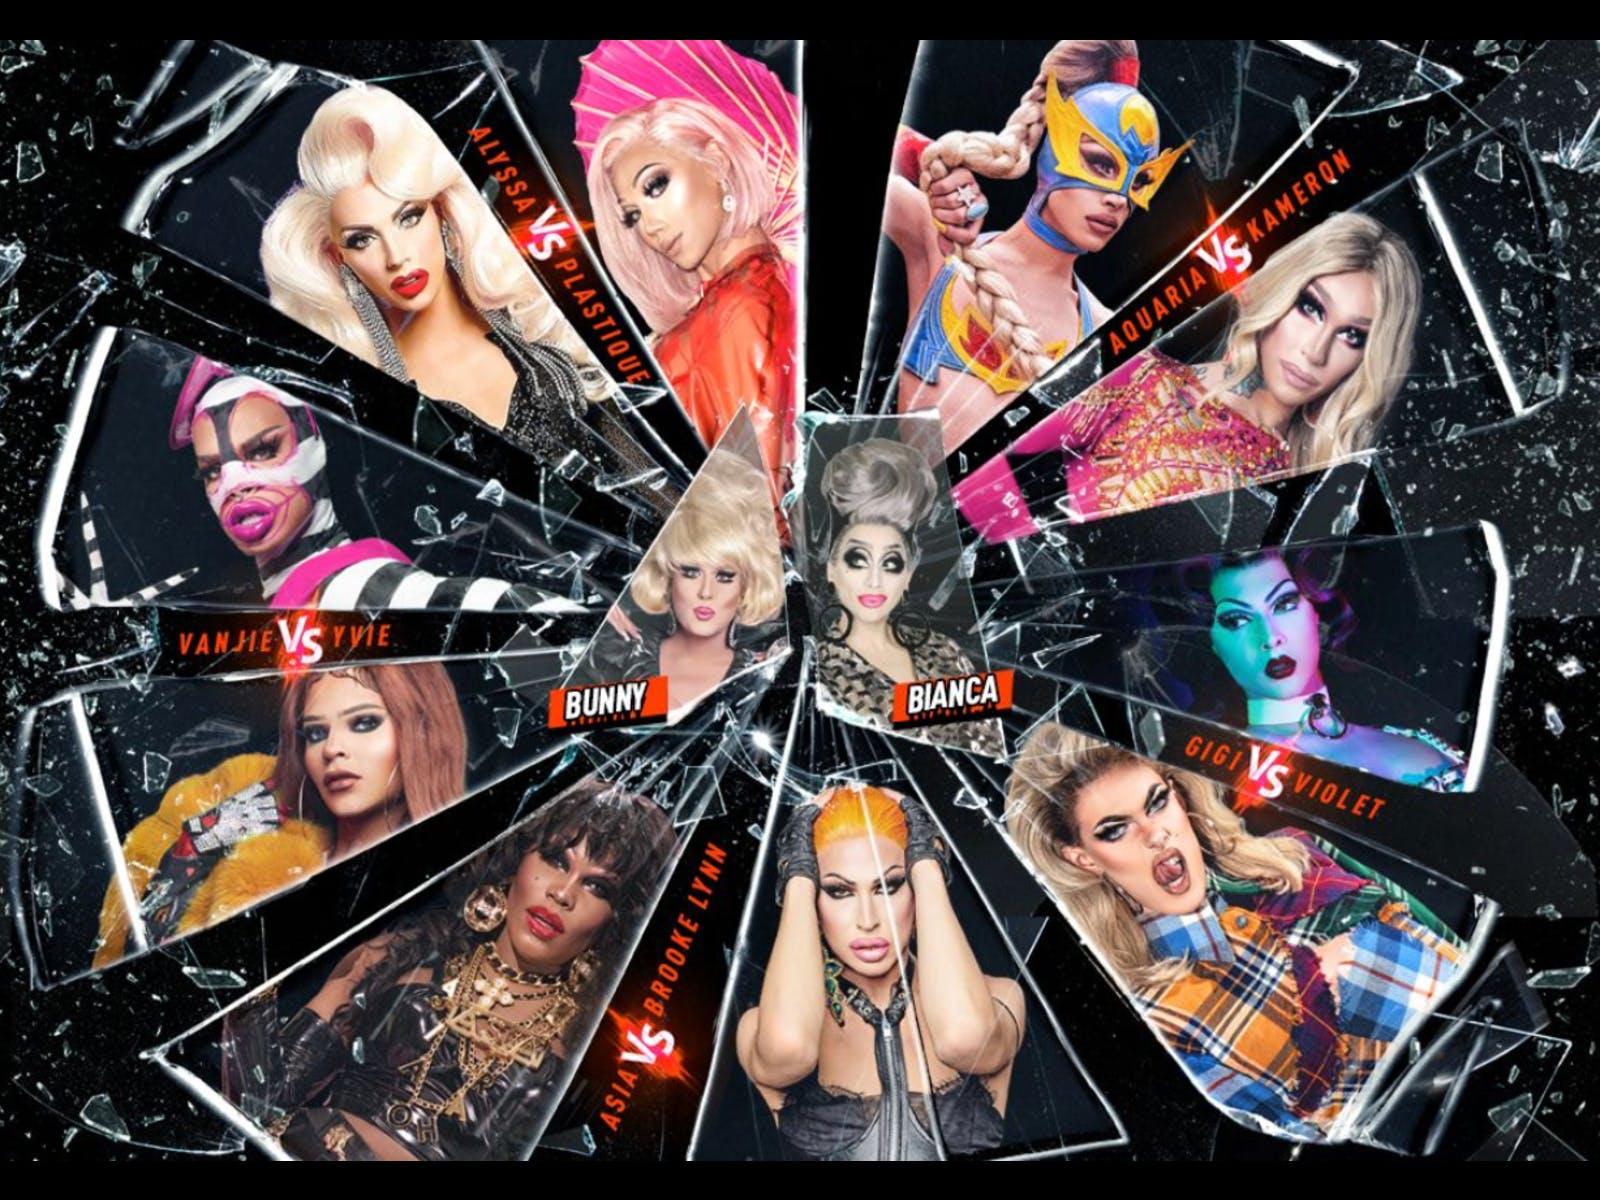 Halloween 2020 Showtimes Connecticut Werq the World   Battle Royale Tickets | New York | TodayTix